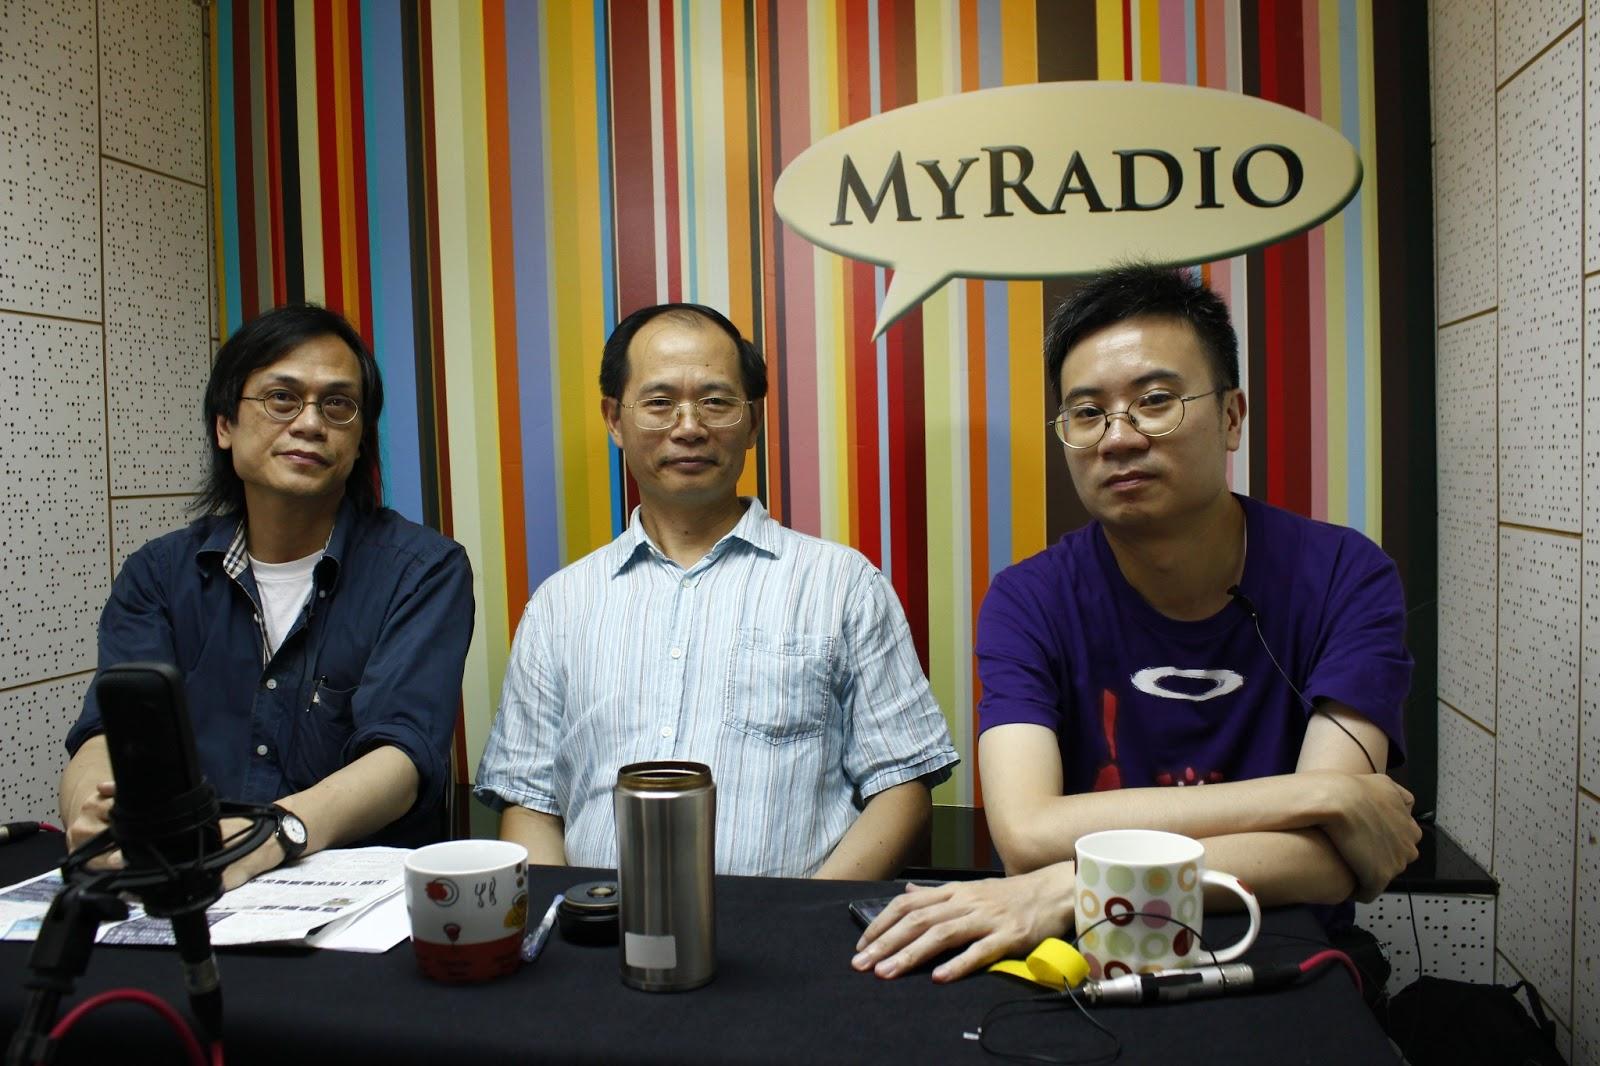 MyRadio.HK 臺務網誌: 黃毓民 毓民踩場 130704 ep505